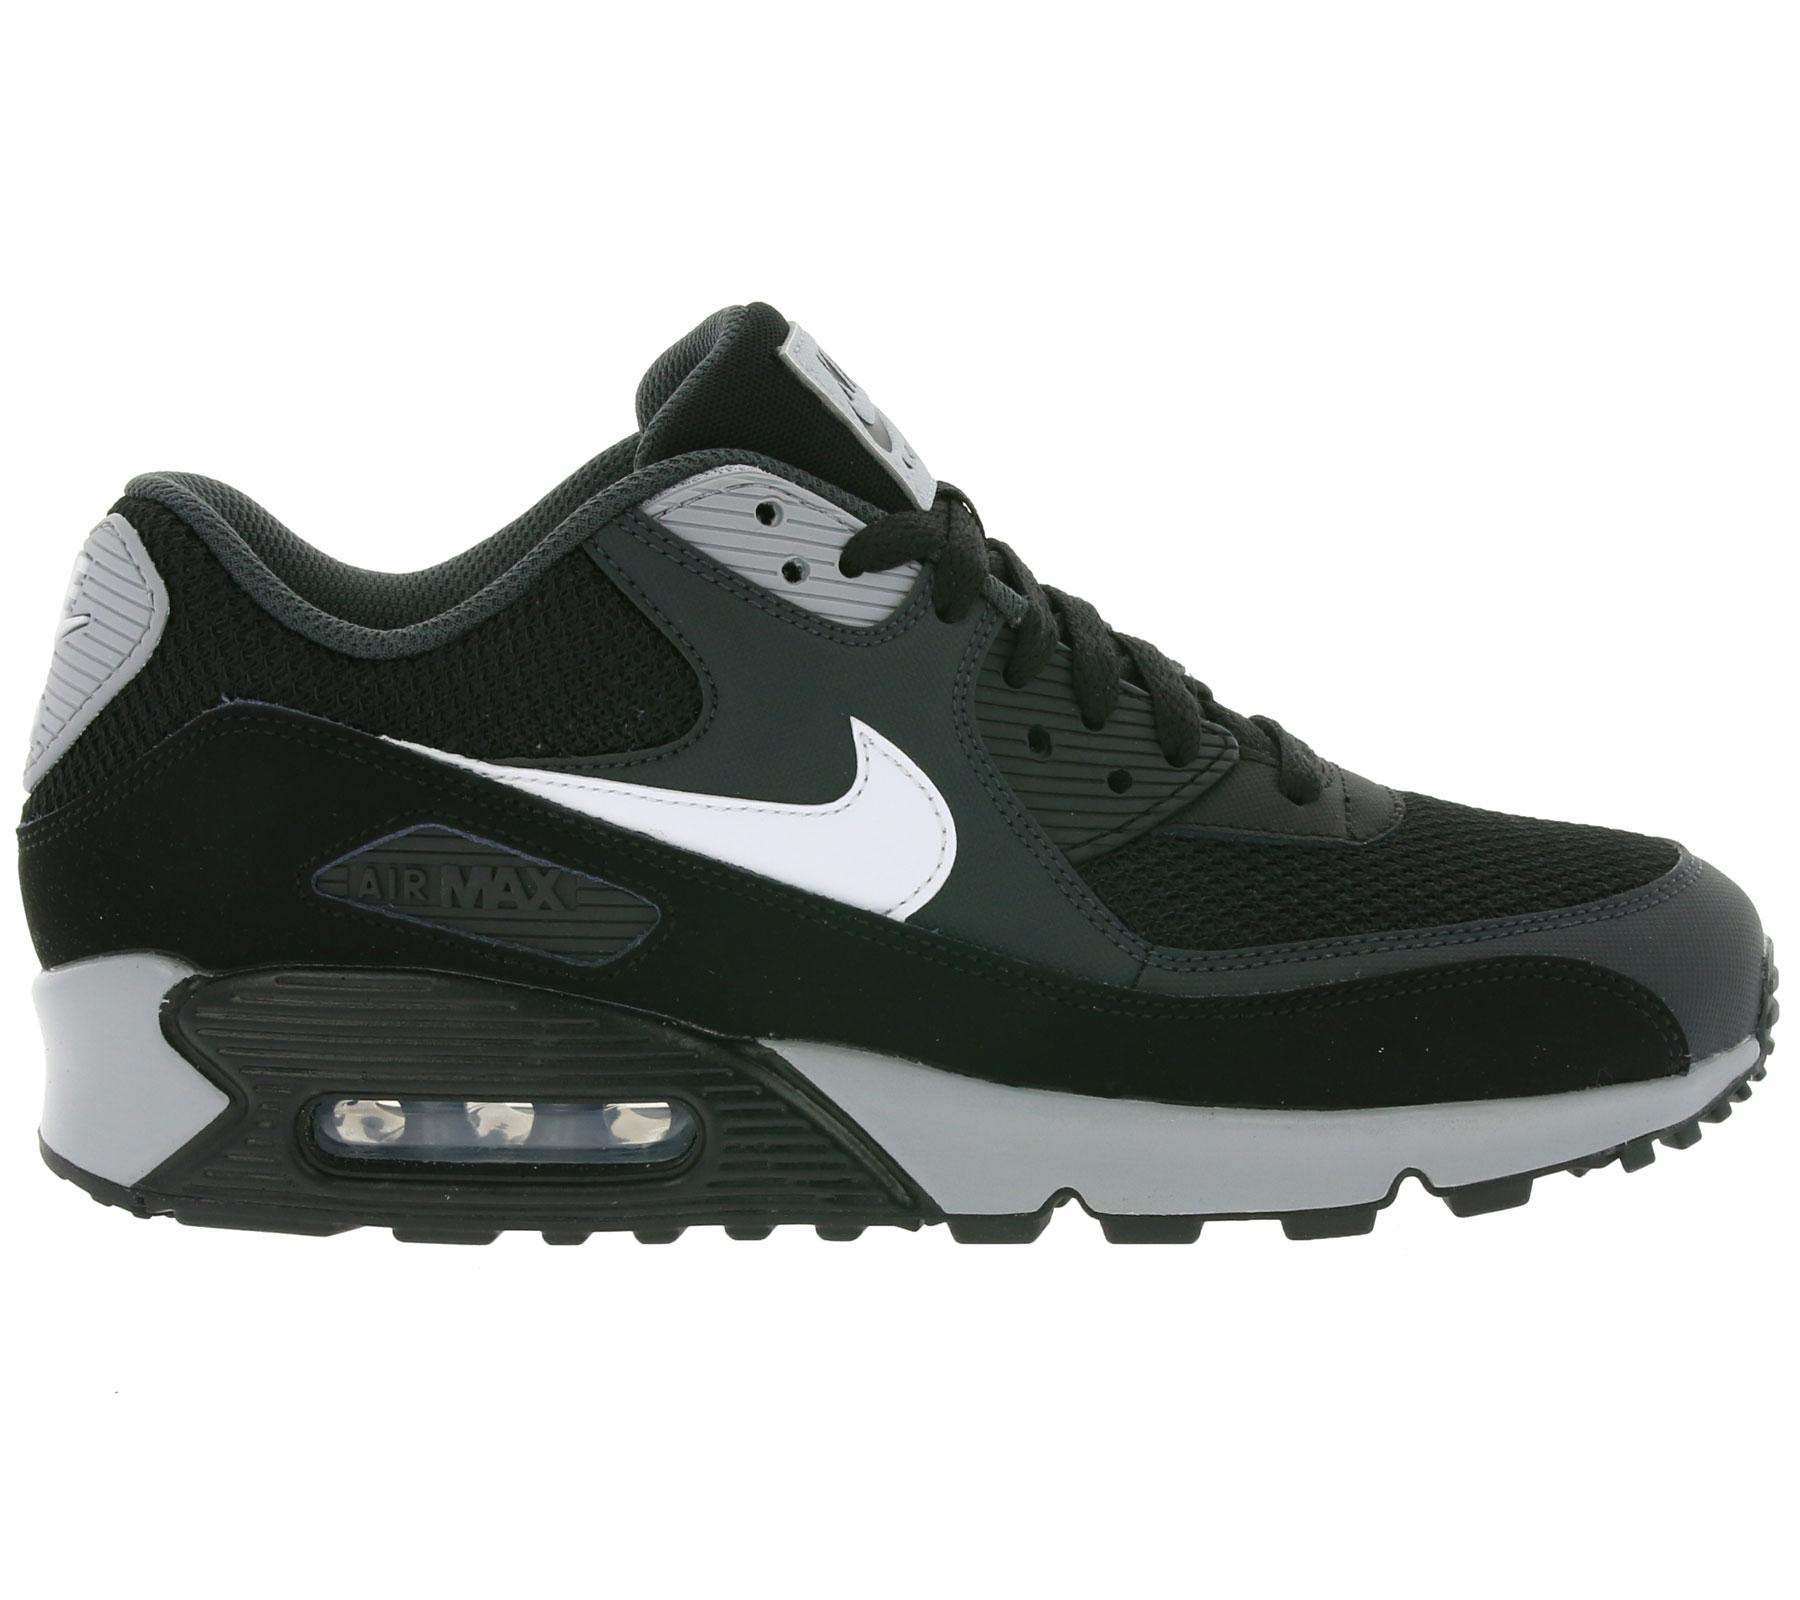 Nike Air Max 90 Essential (Farbe: Schwarz/Grau/Weiß) für  79,99€ [Outlet46]